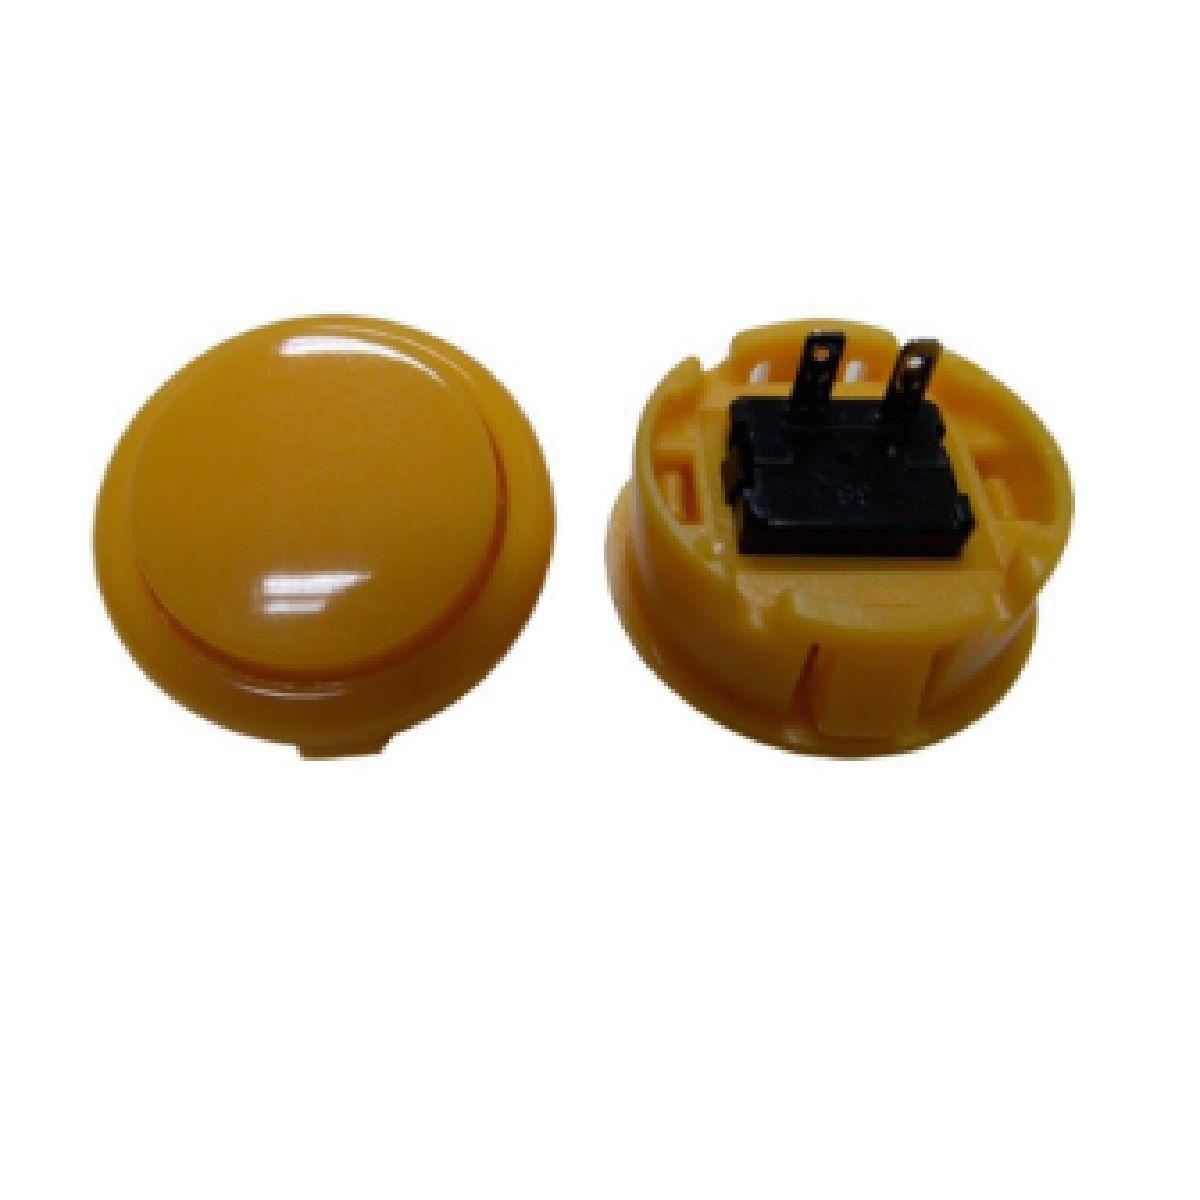 Botão Arcade Fliperama Alta Performance Tipo Sanwa (conector 2.8mm) Amarelo